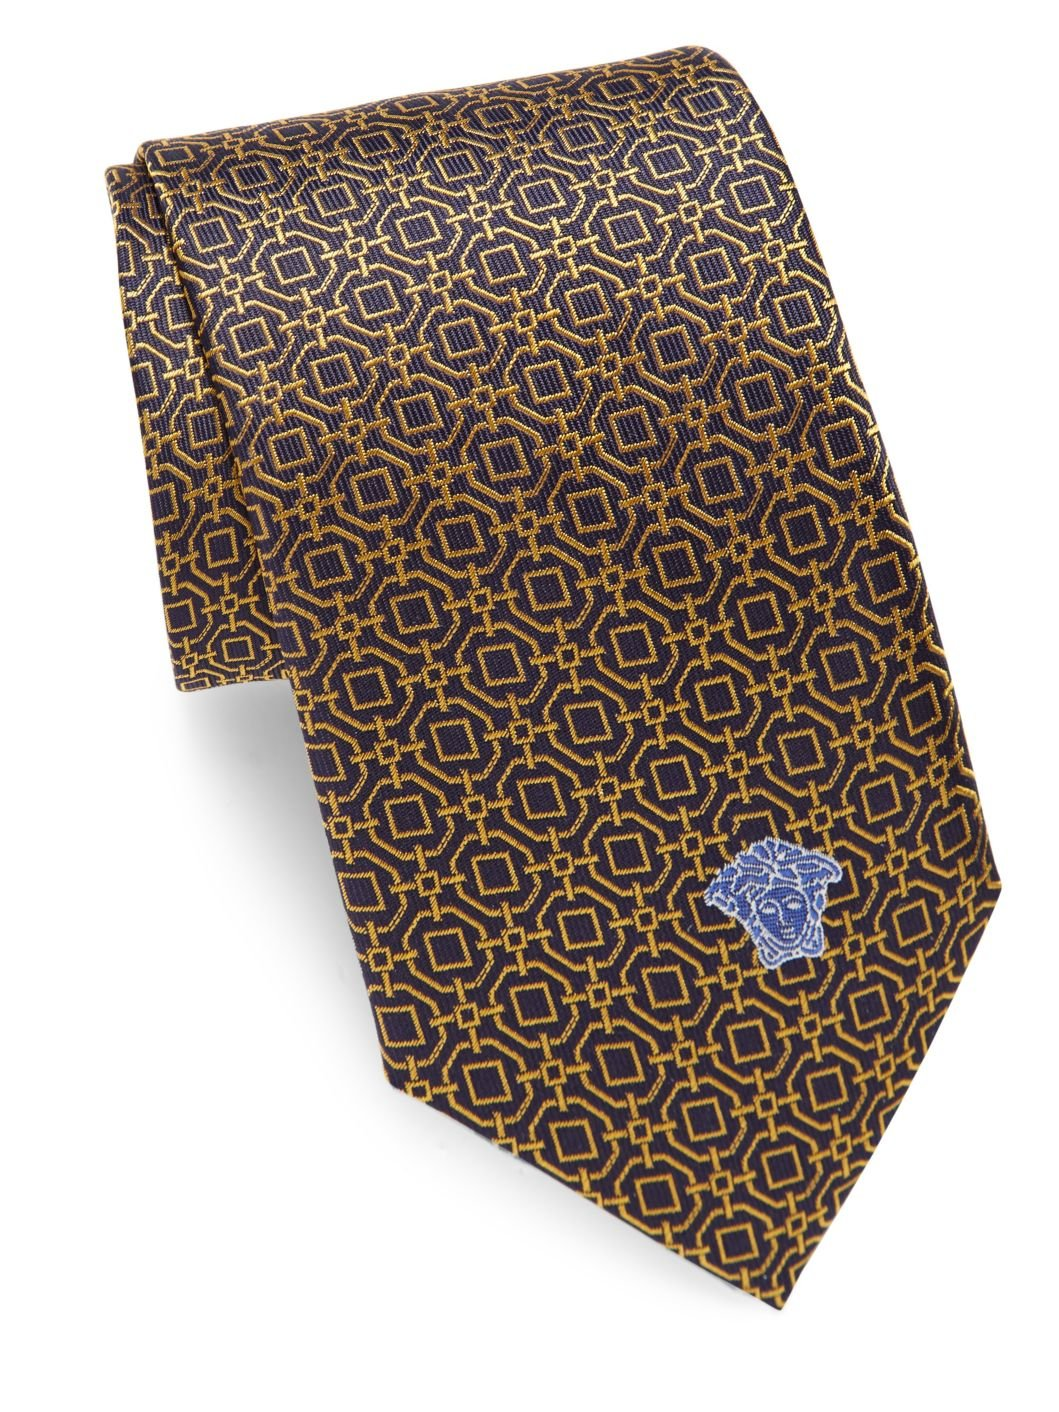 Versace Men's Medallion Print Italian Silk Tie, OS, Yellow